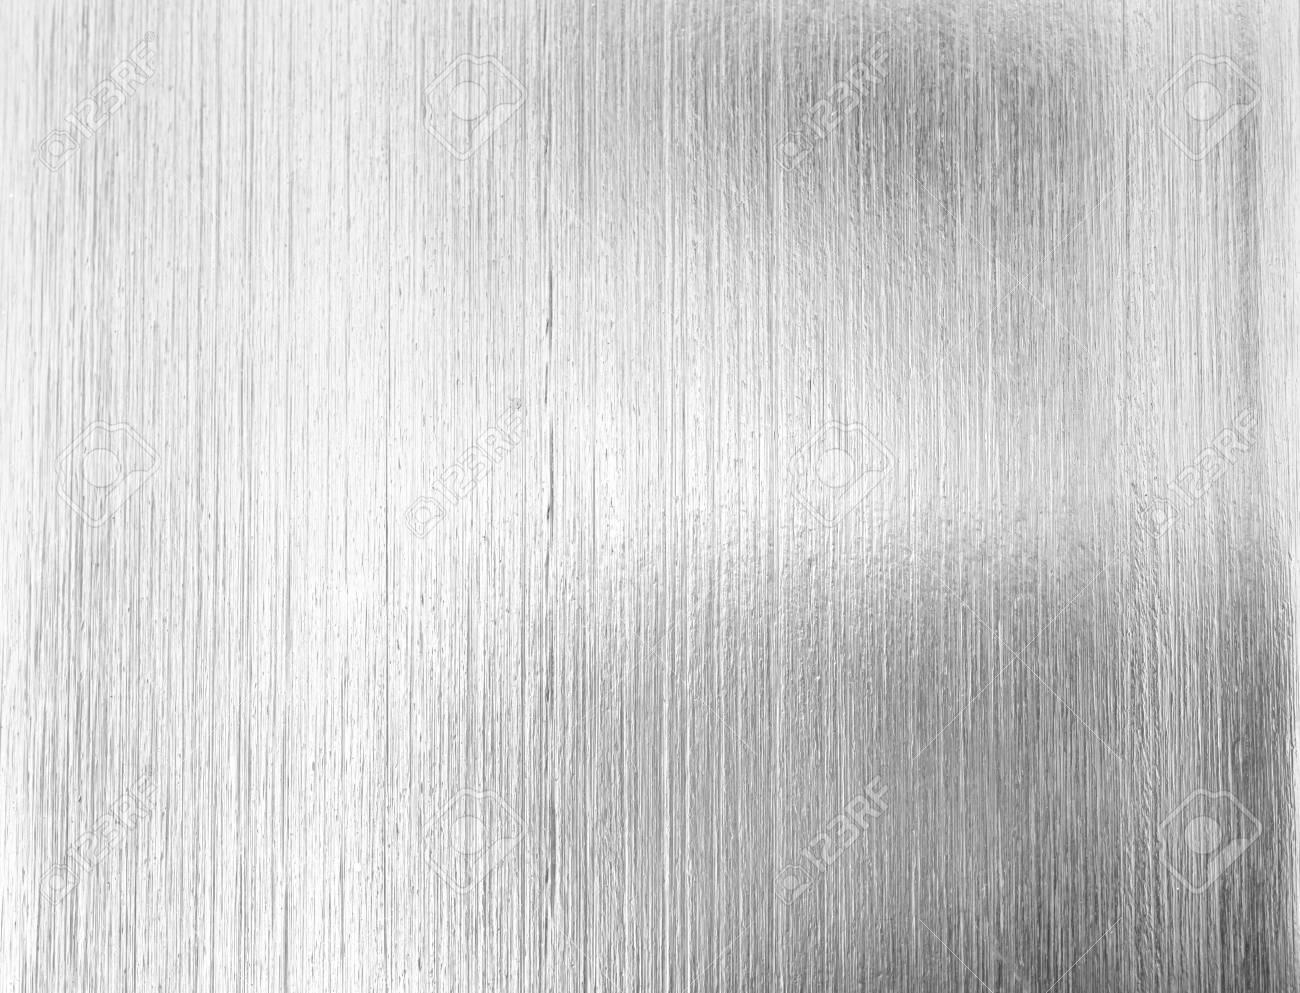 stainless steel texture black